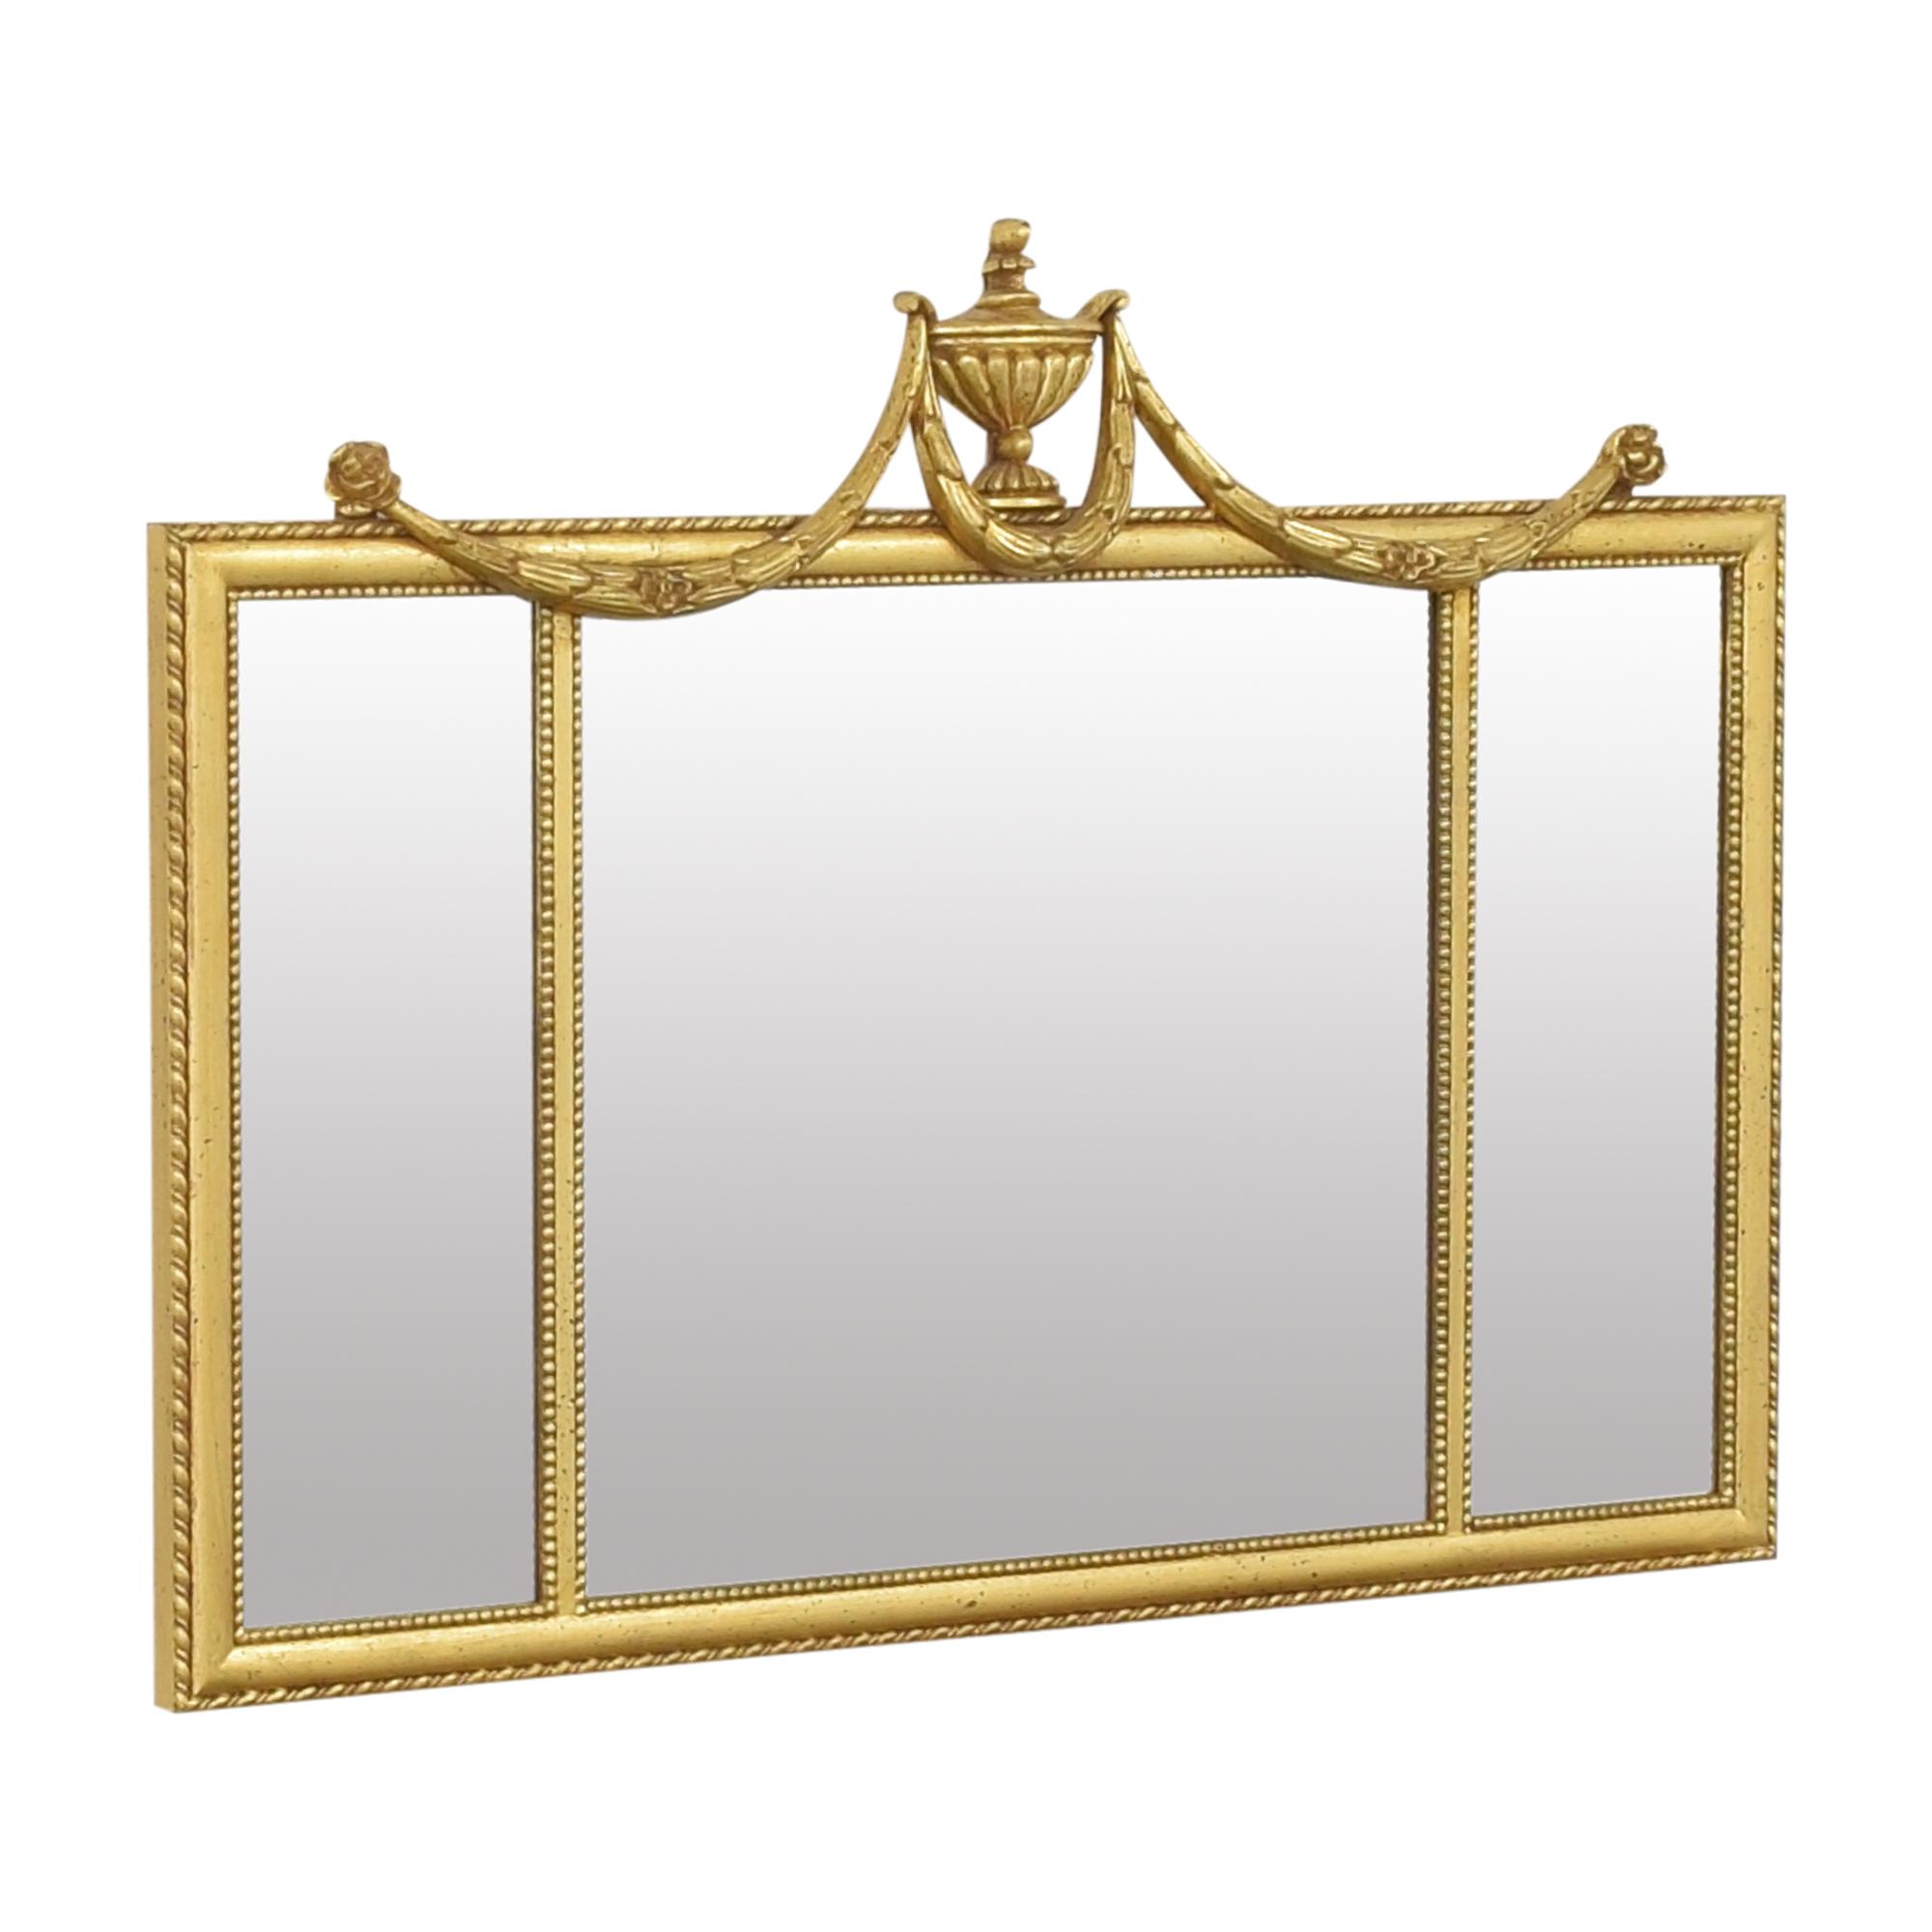 Ethan Allen Ethan Allen Three Panel Wall Mirror ct